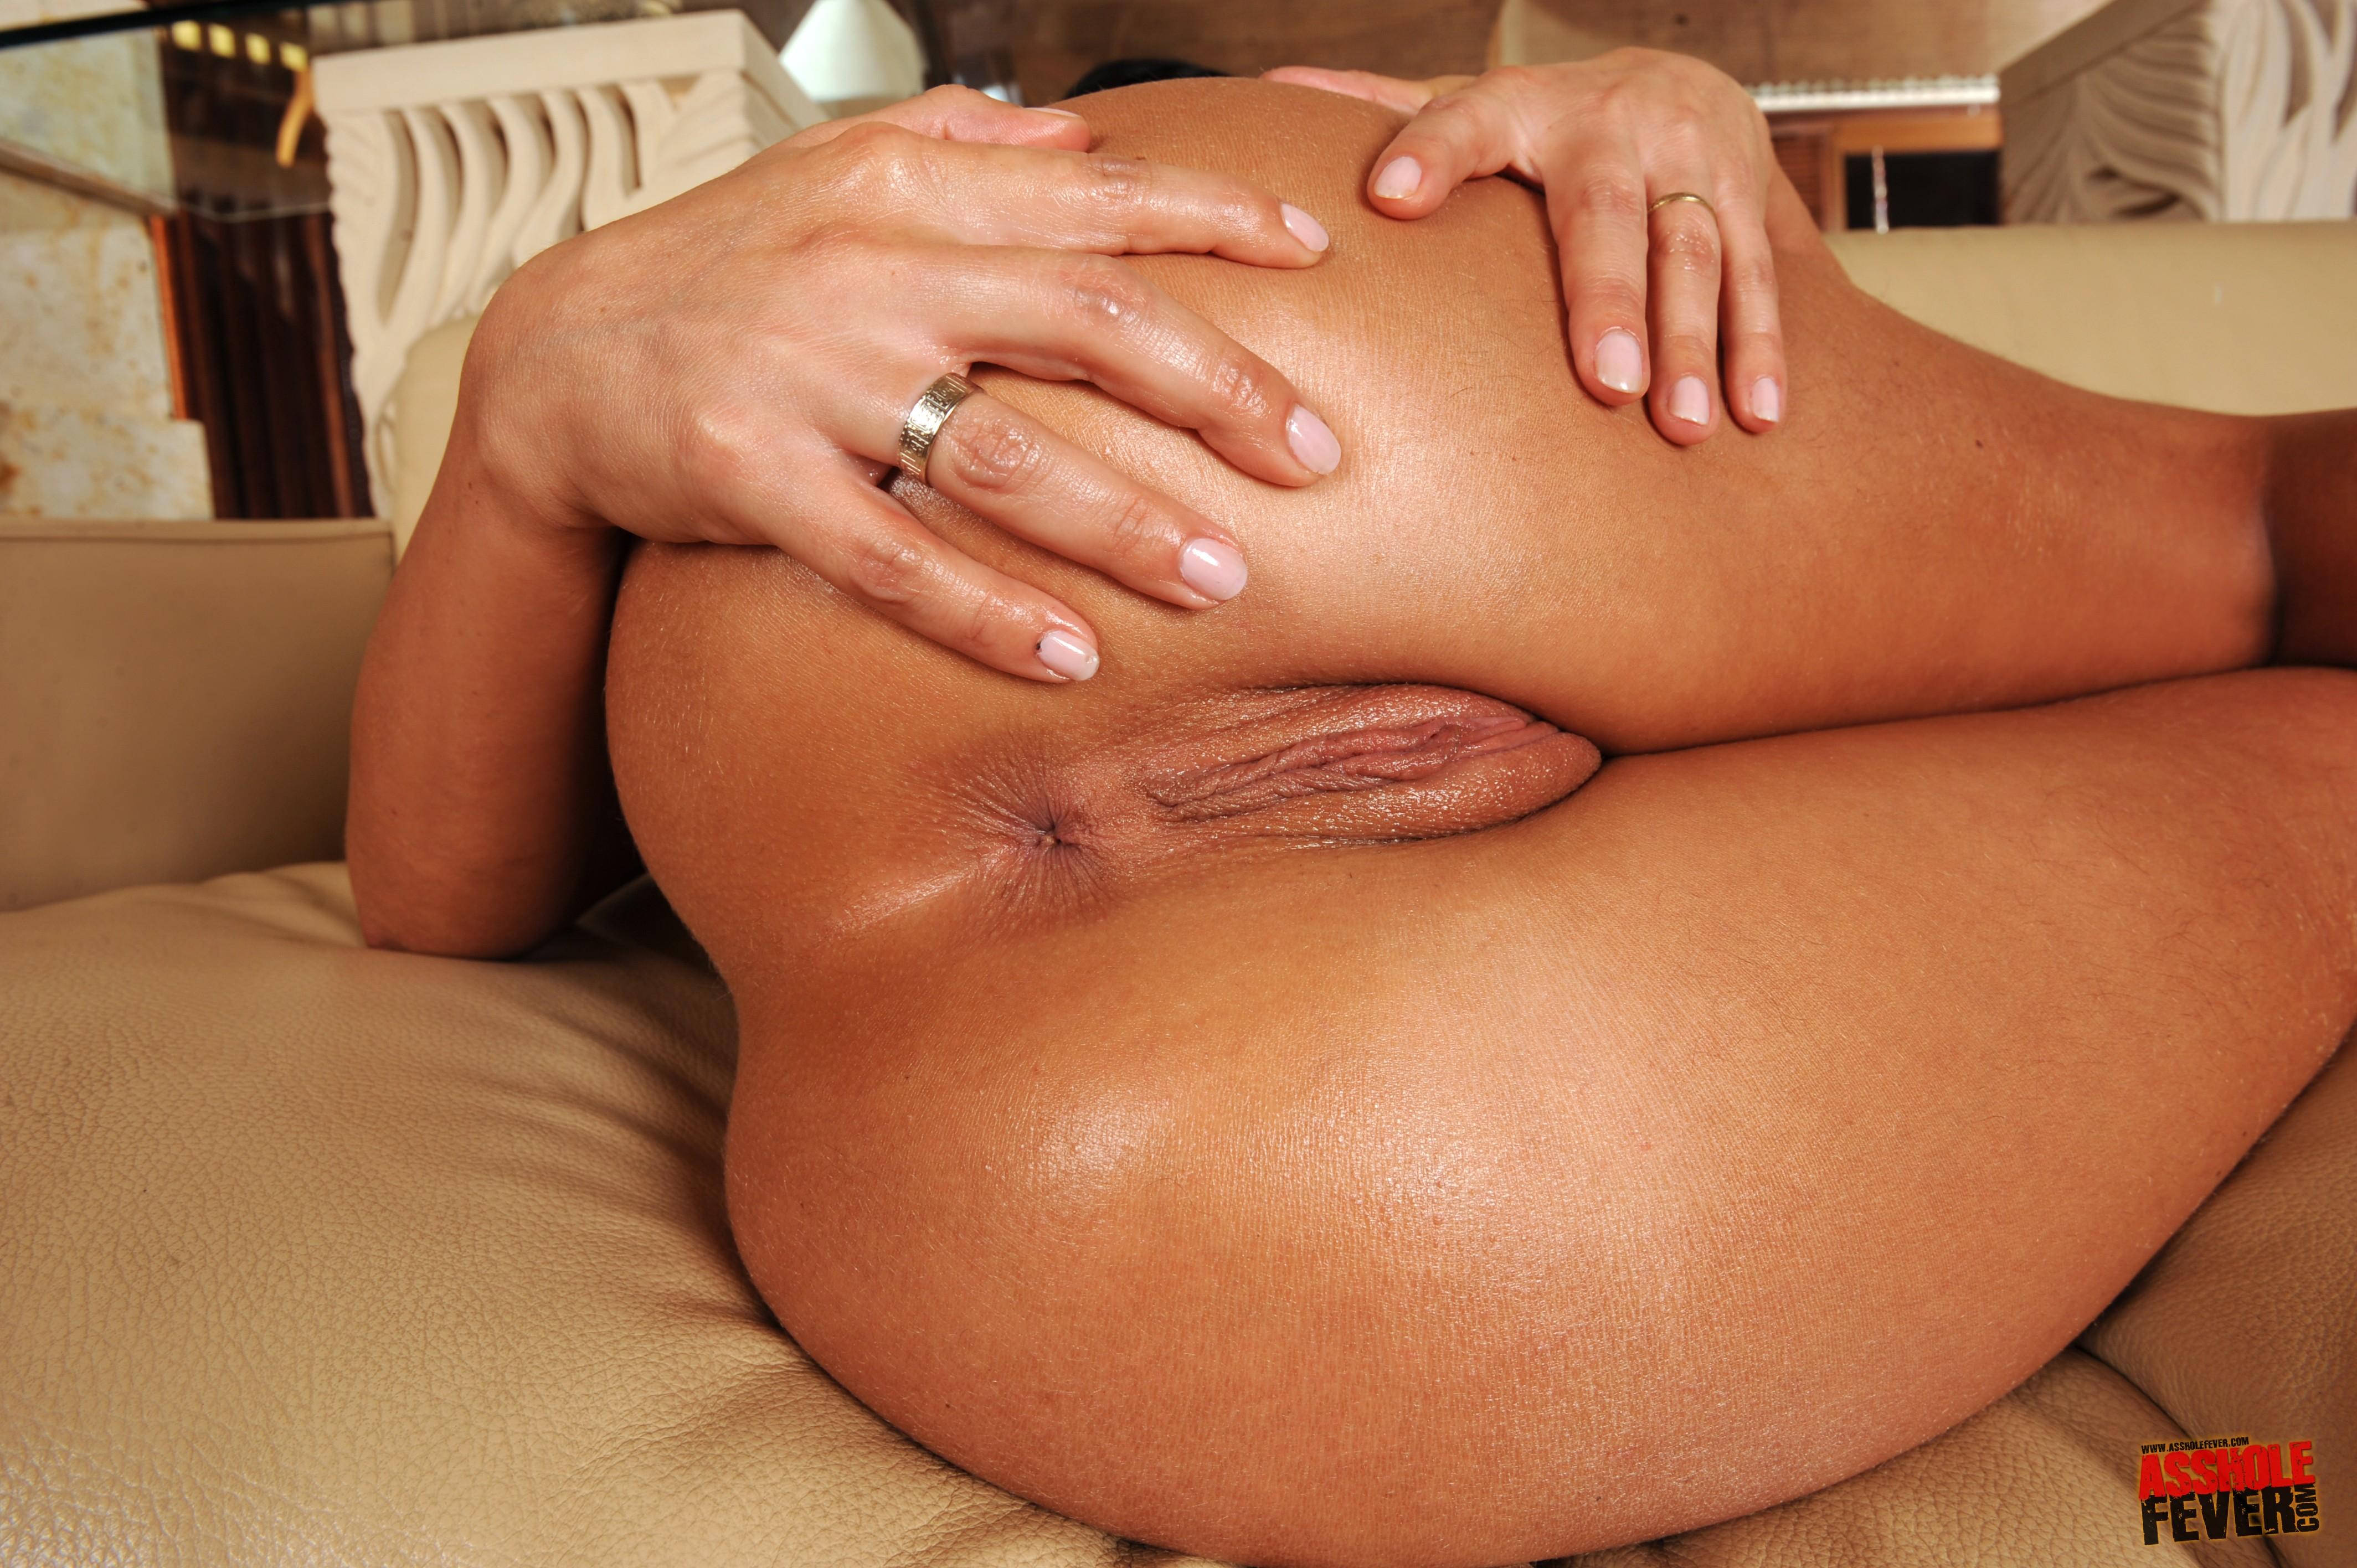 Pam andeson having anal